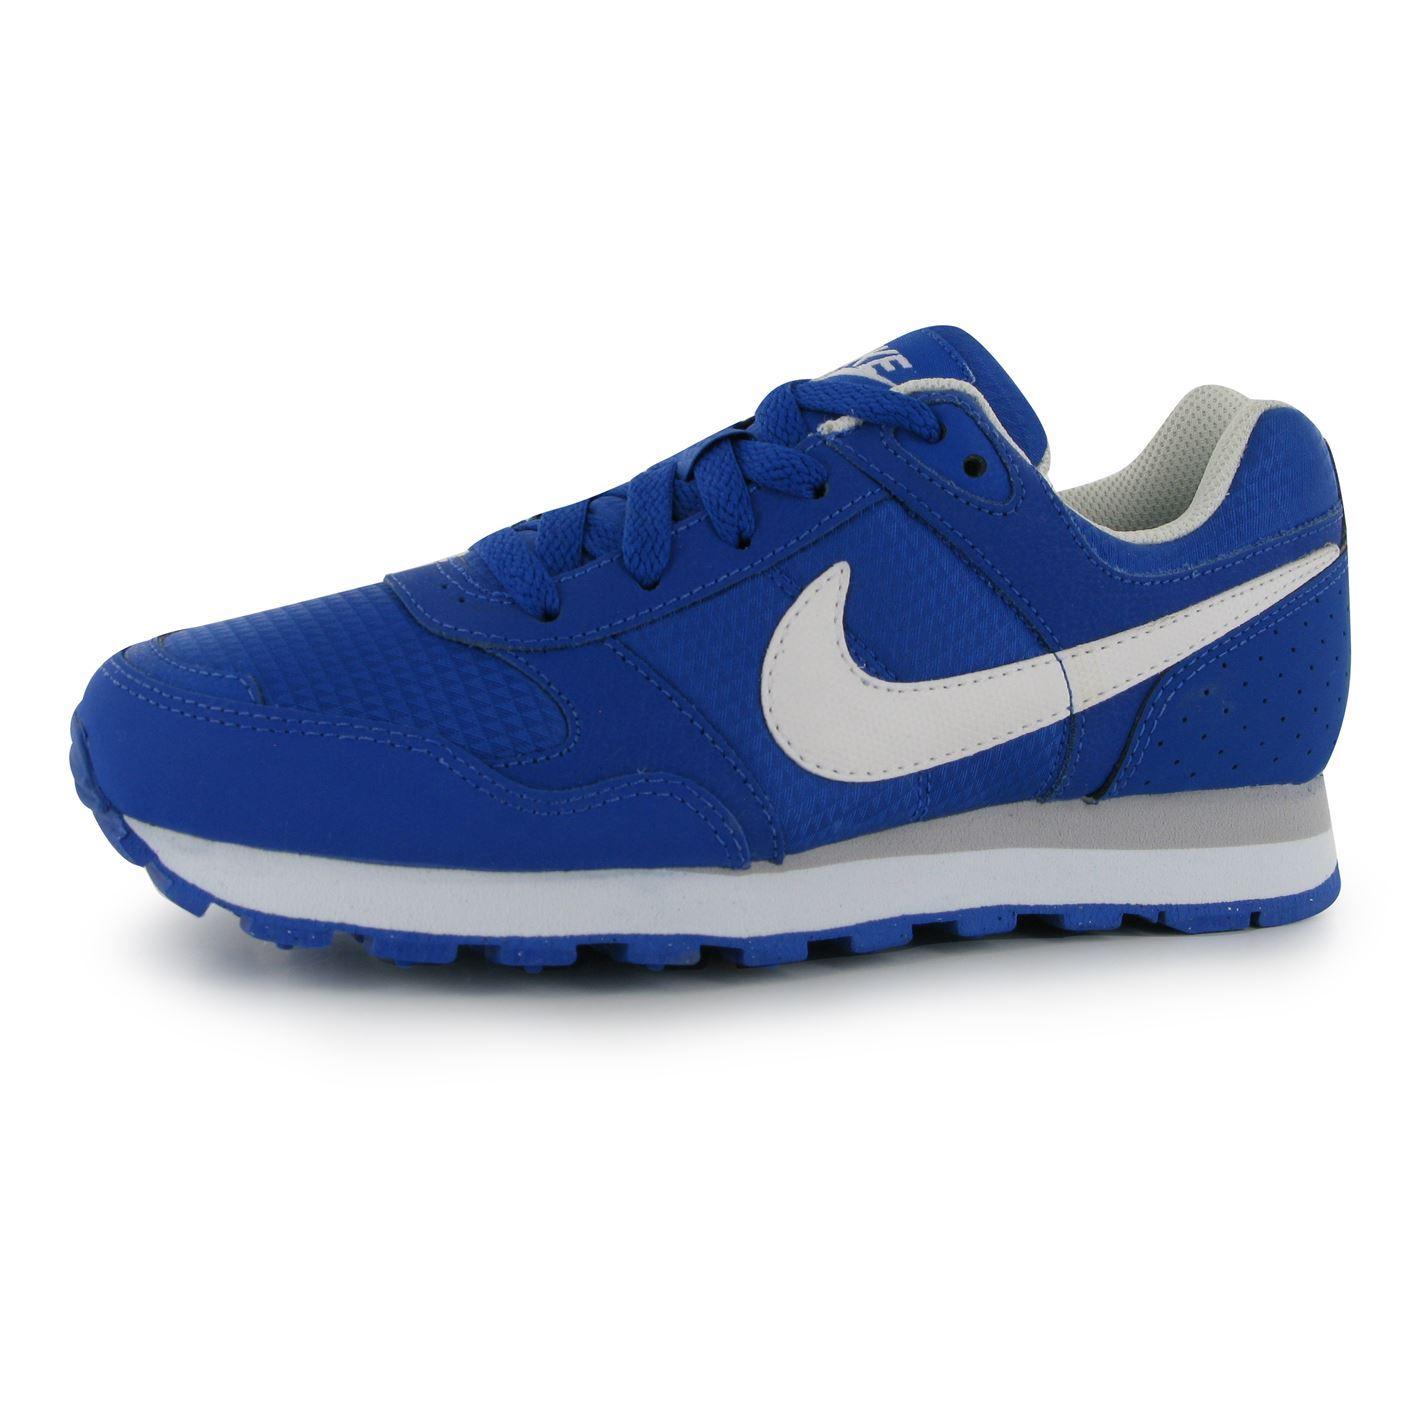 nike shoes for boys running thehoneycombimaging co uk